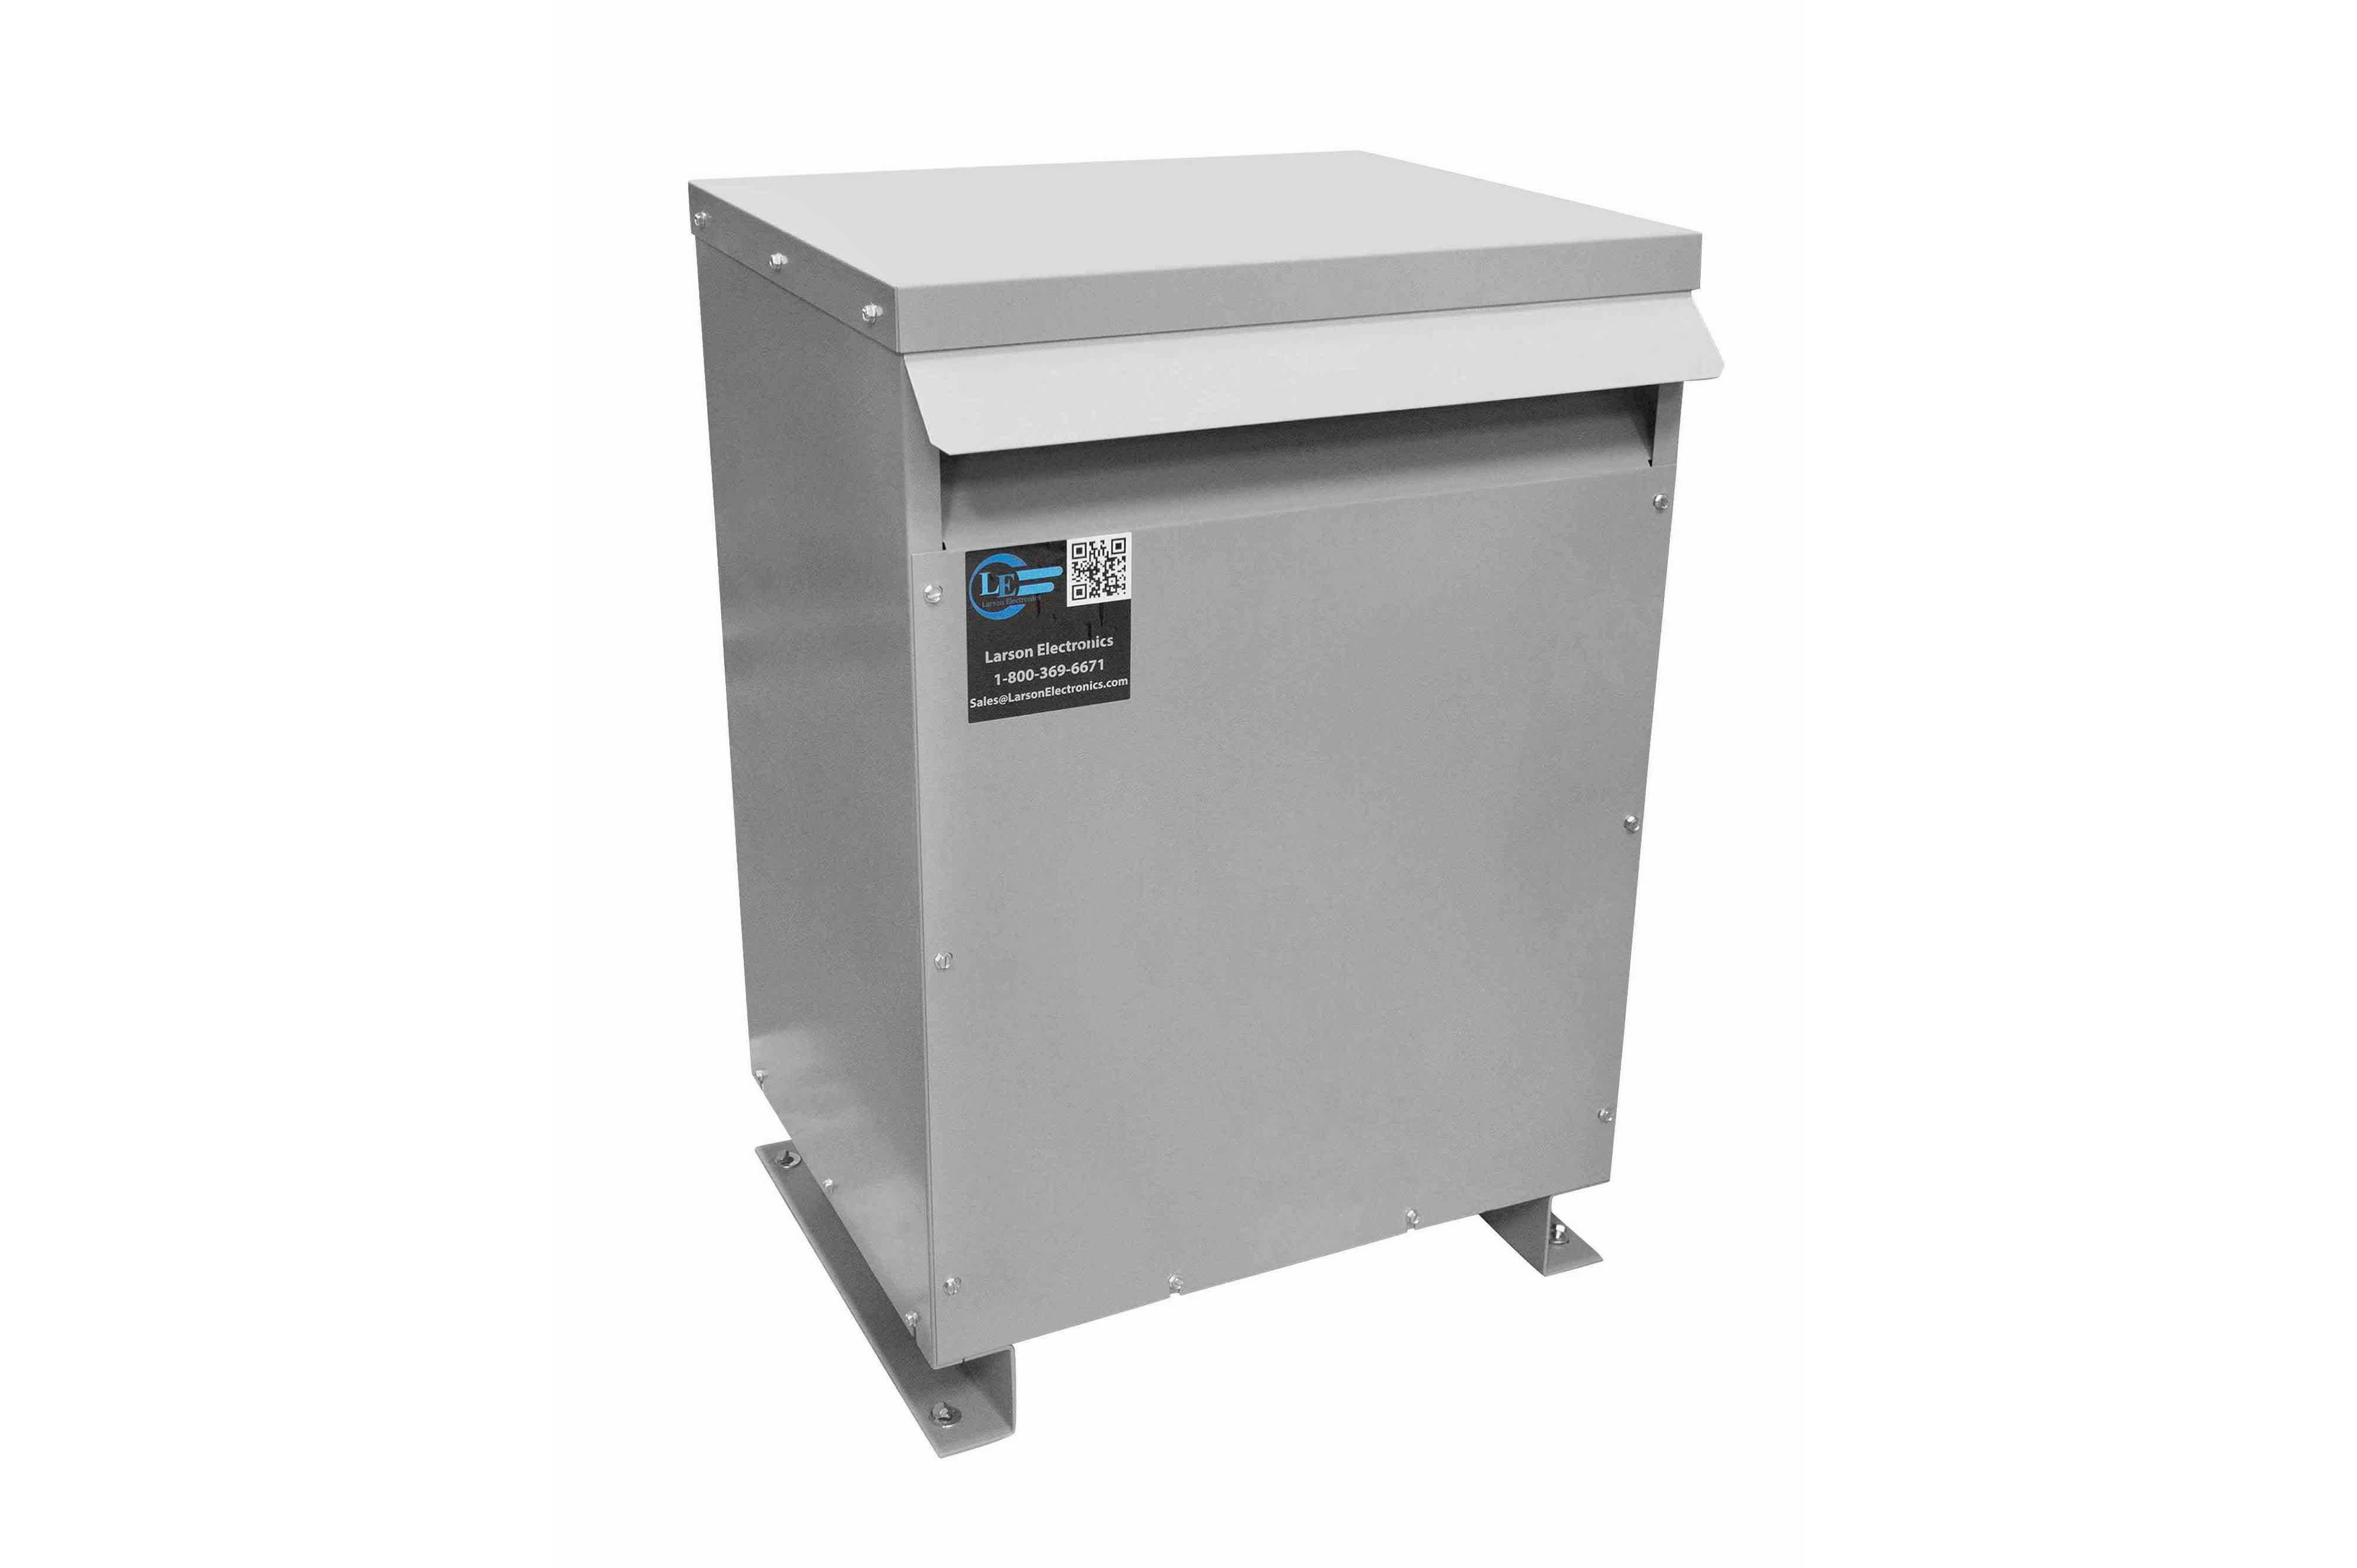 36 kVA 3PH DOE Transformer, 380V Delta Primary, 208Y/120 Wye-N Secondary, N3R, Ventilated, 60 Hz